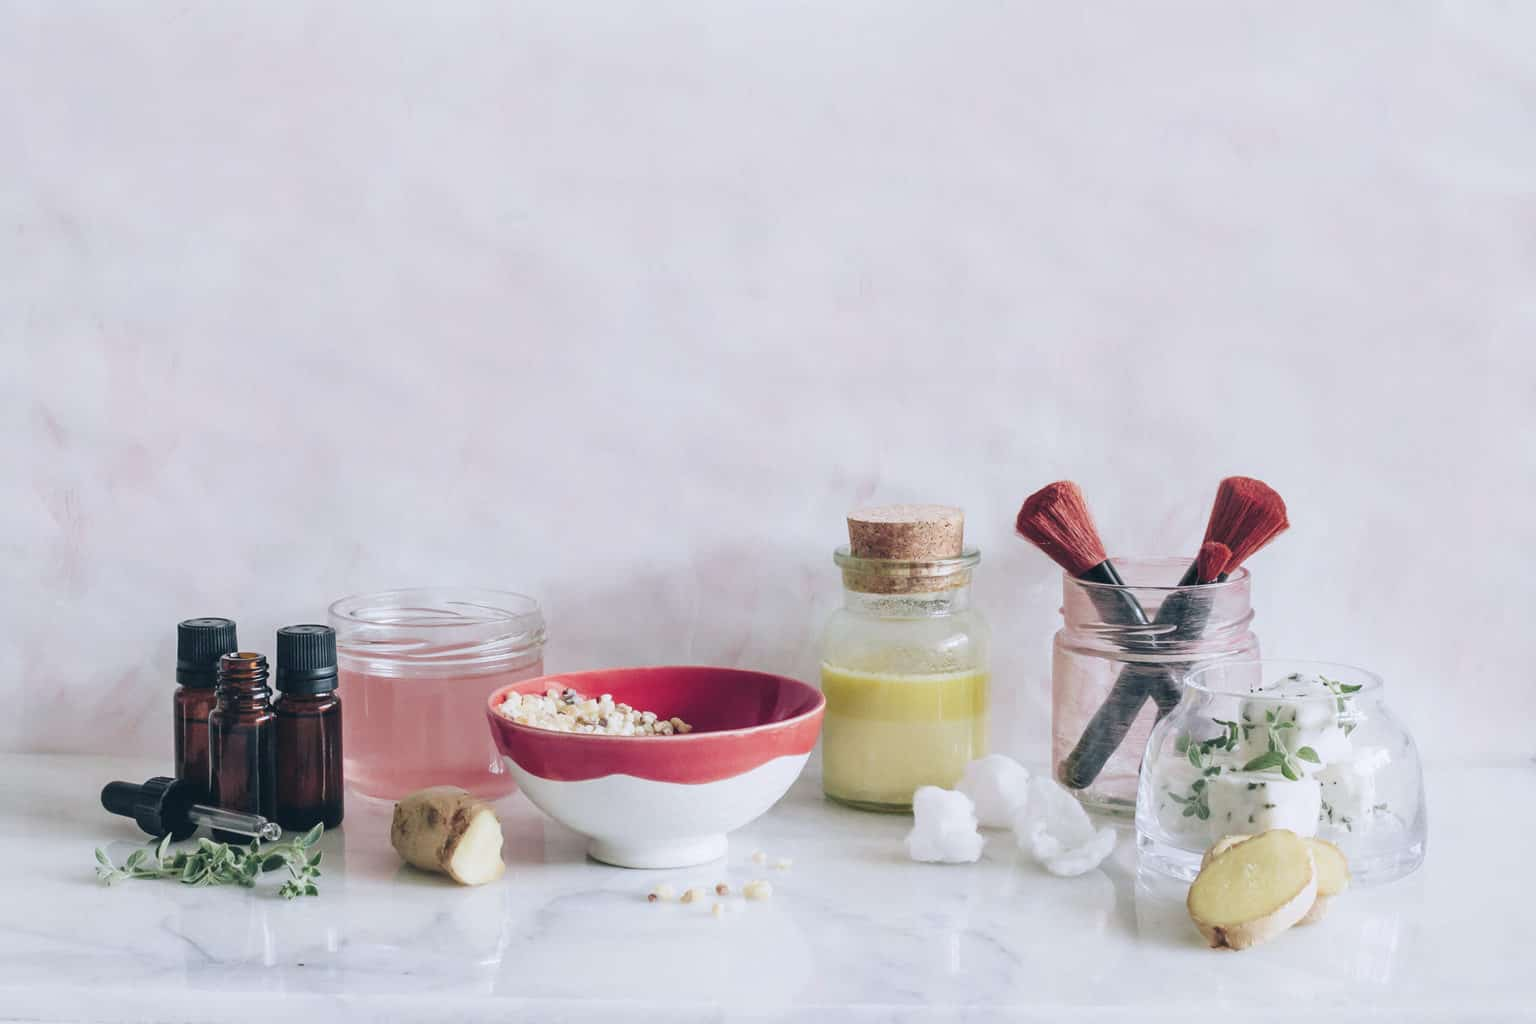 14 Must-Have DIY Beauty Ingredients